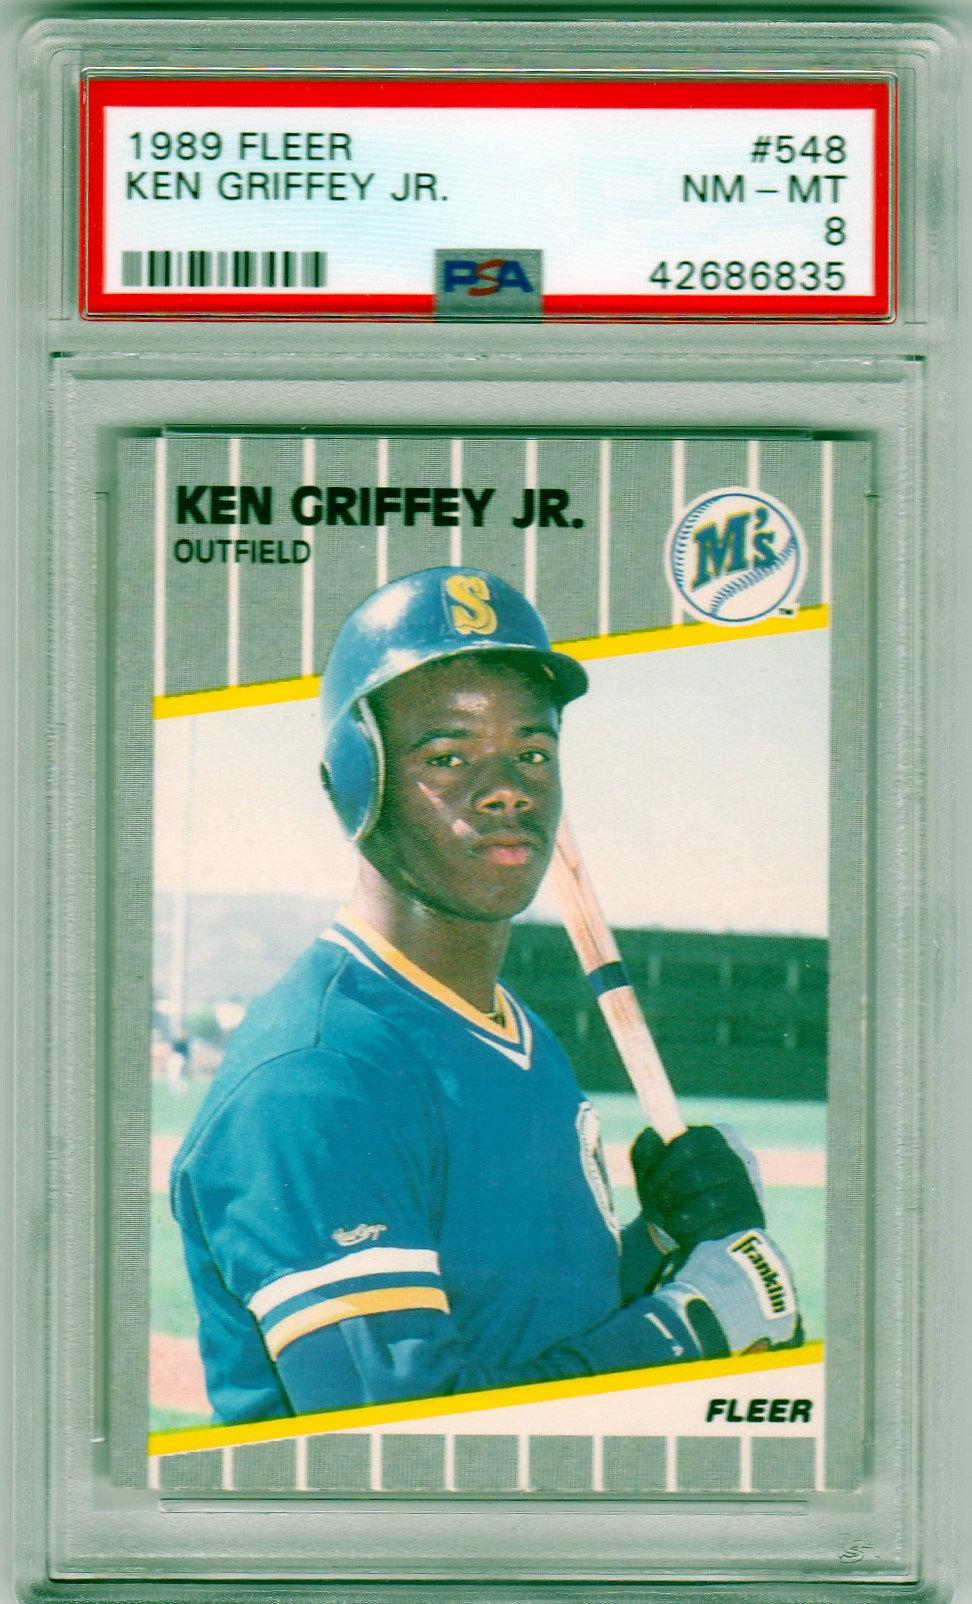 My Psa Submission 1989 Ken Griffey Jr Rookies Collectors